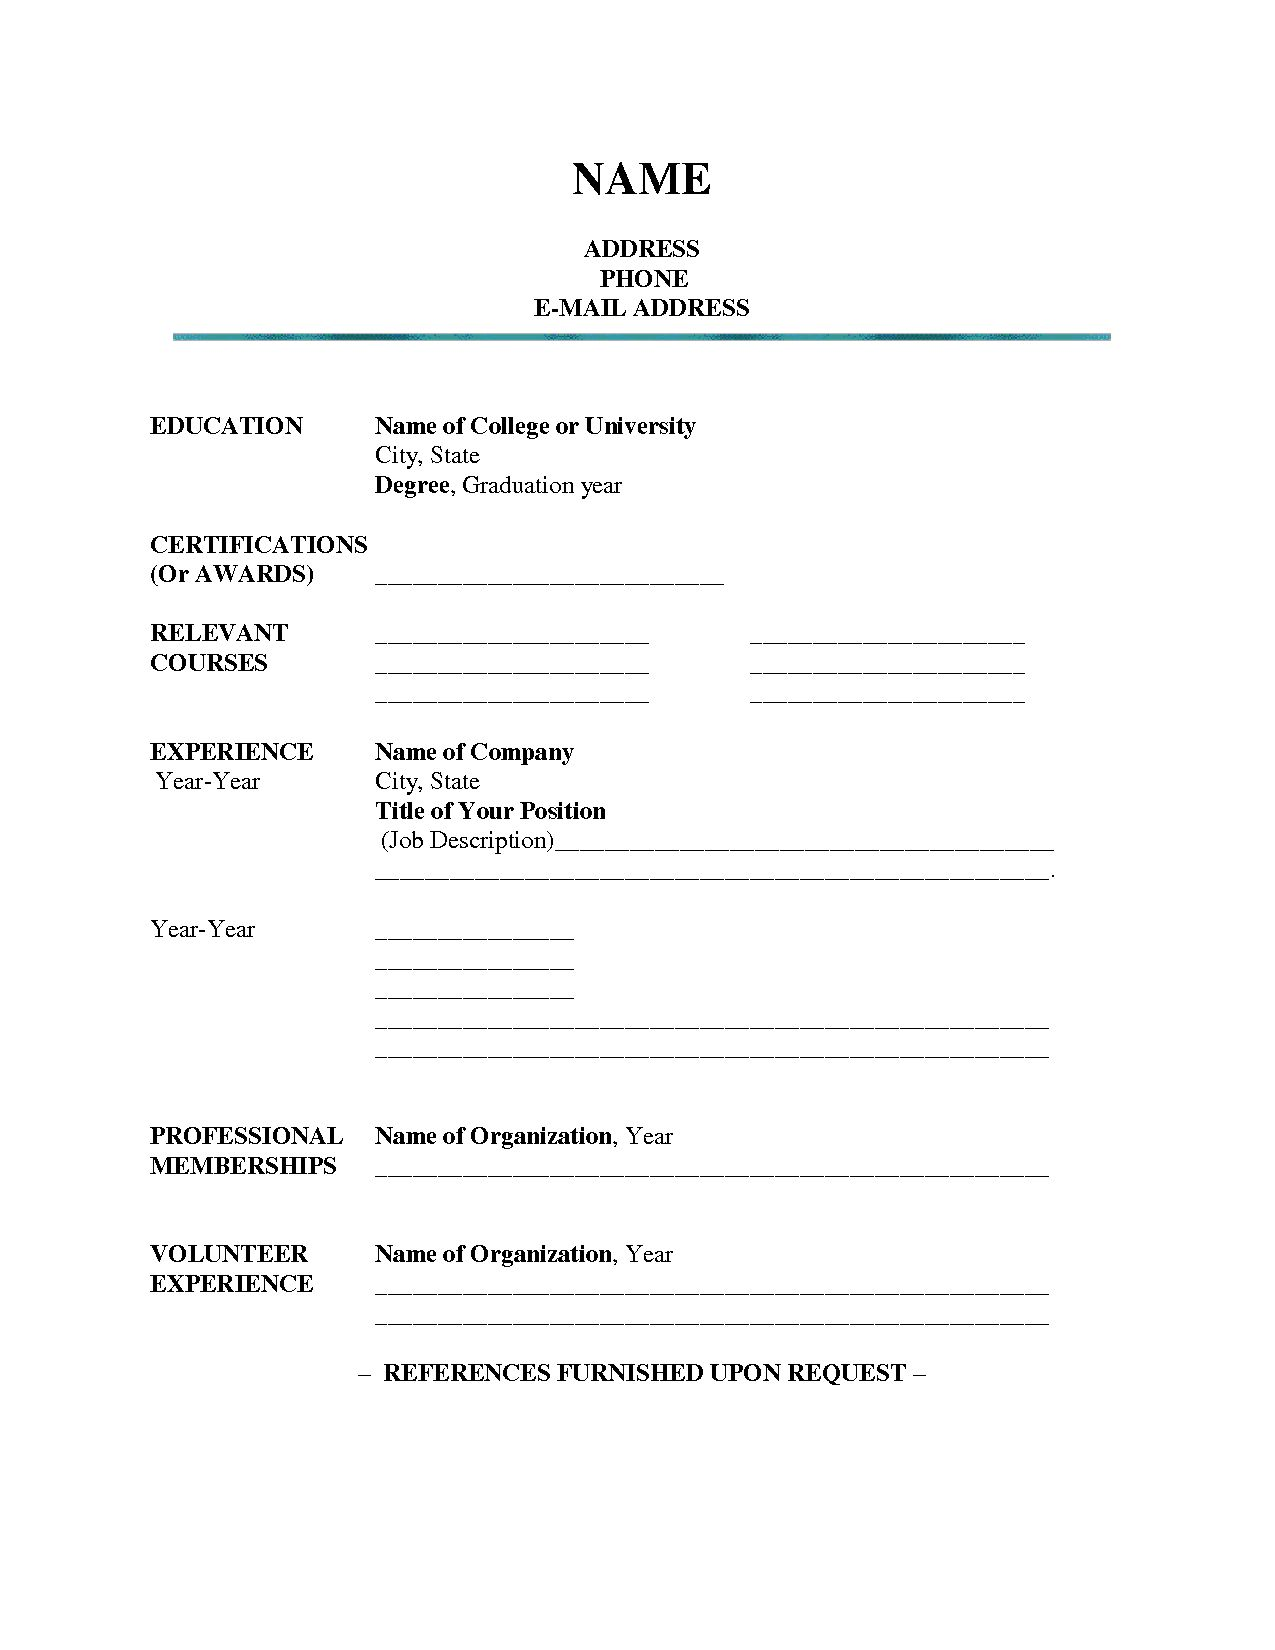 Resume Format Blank Blank Format Resume Resumeformat